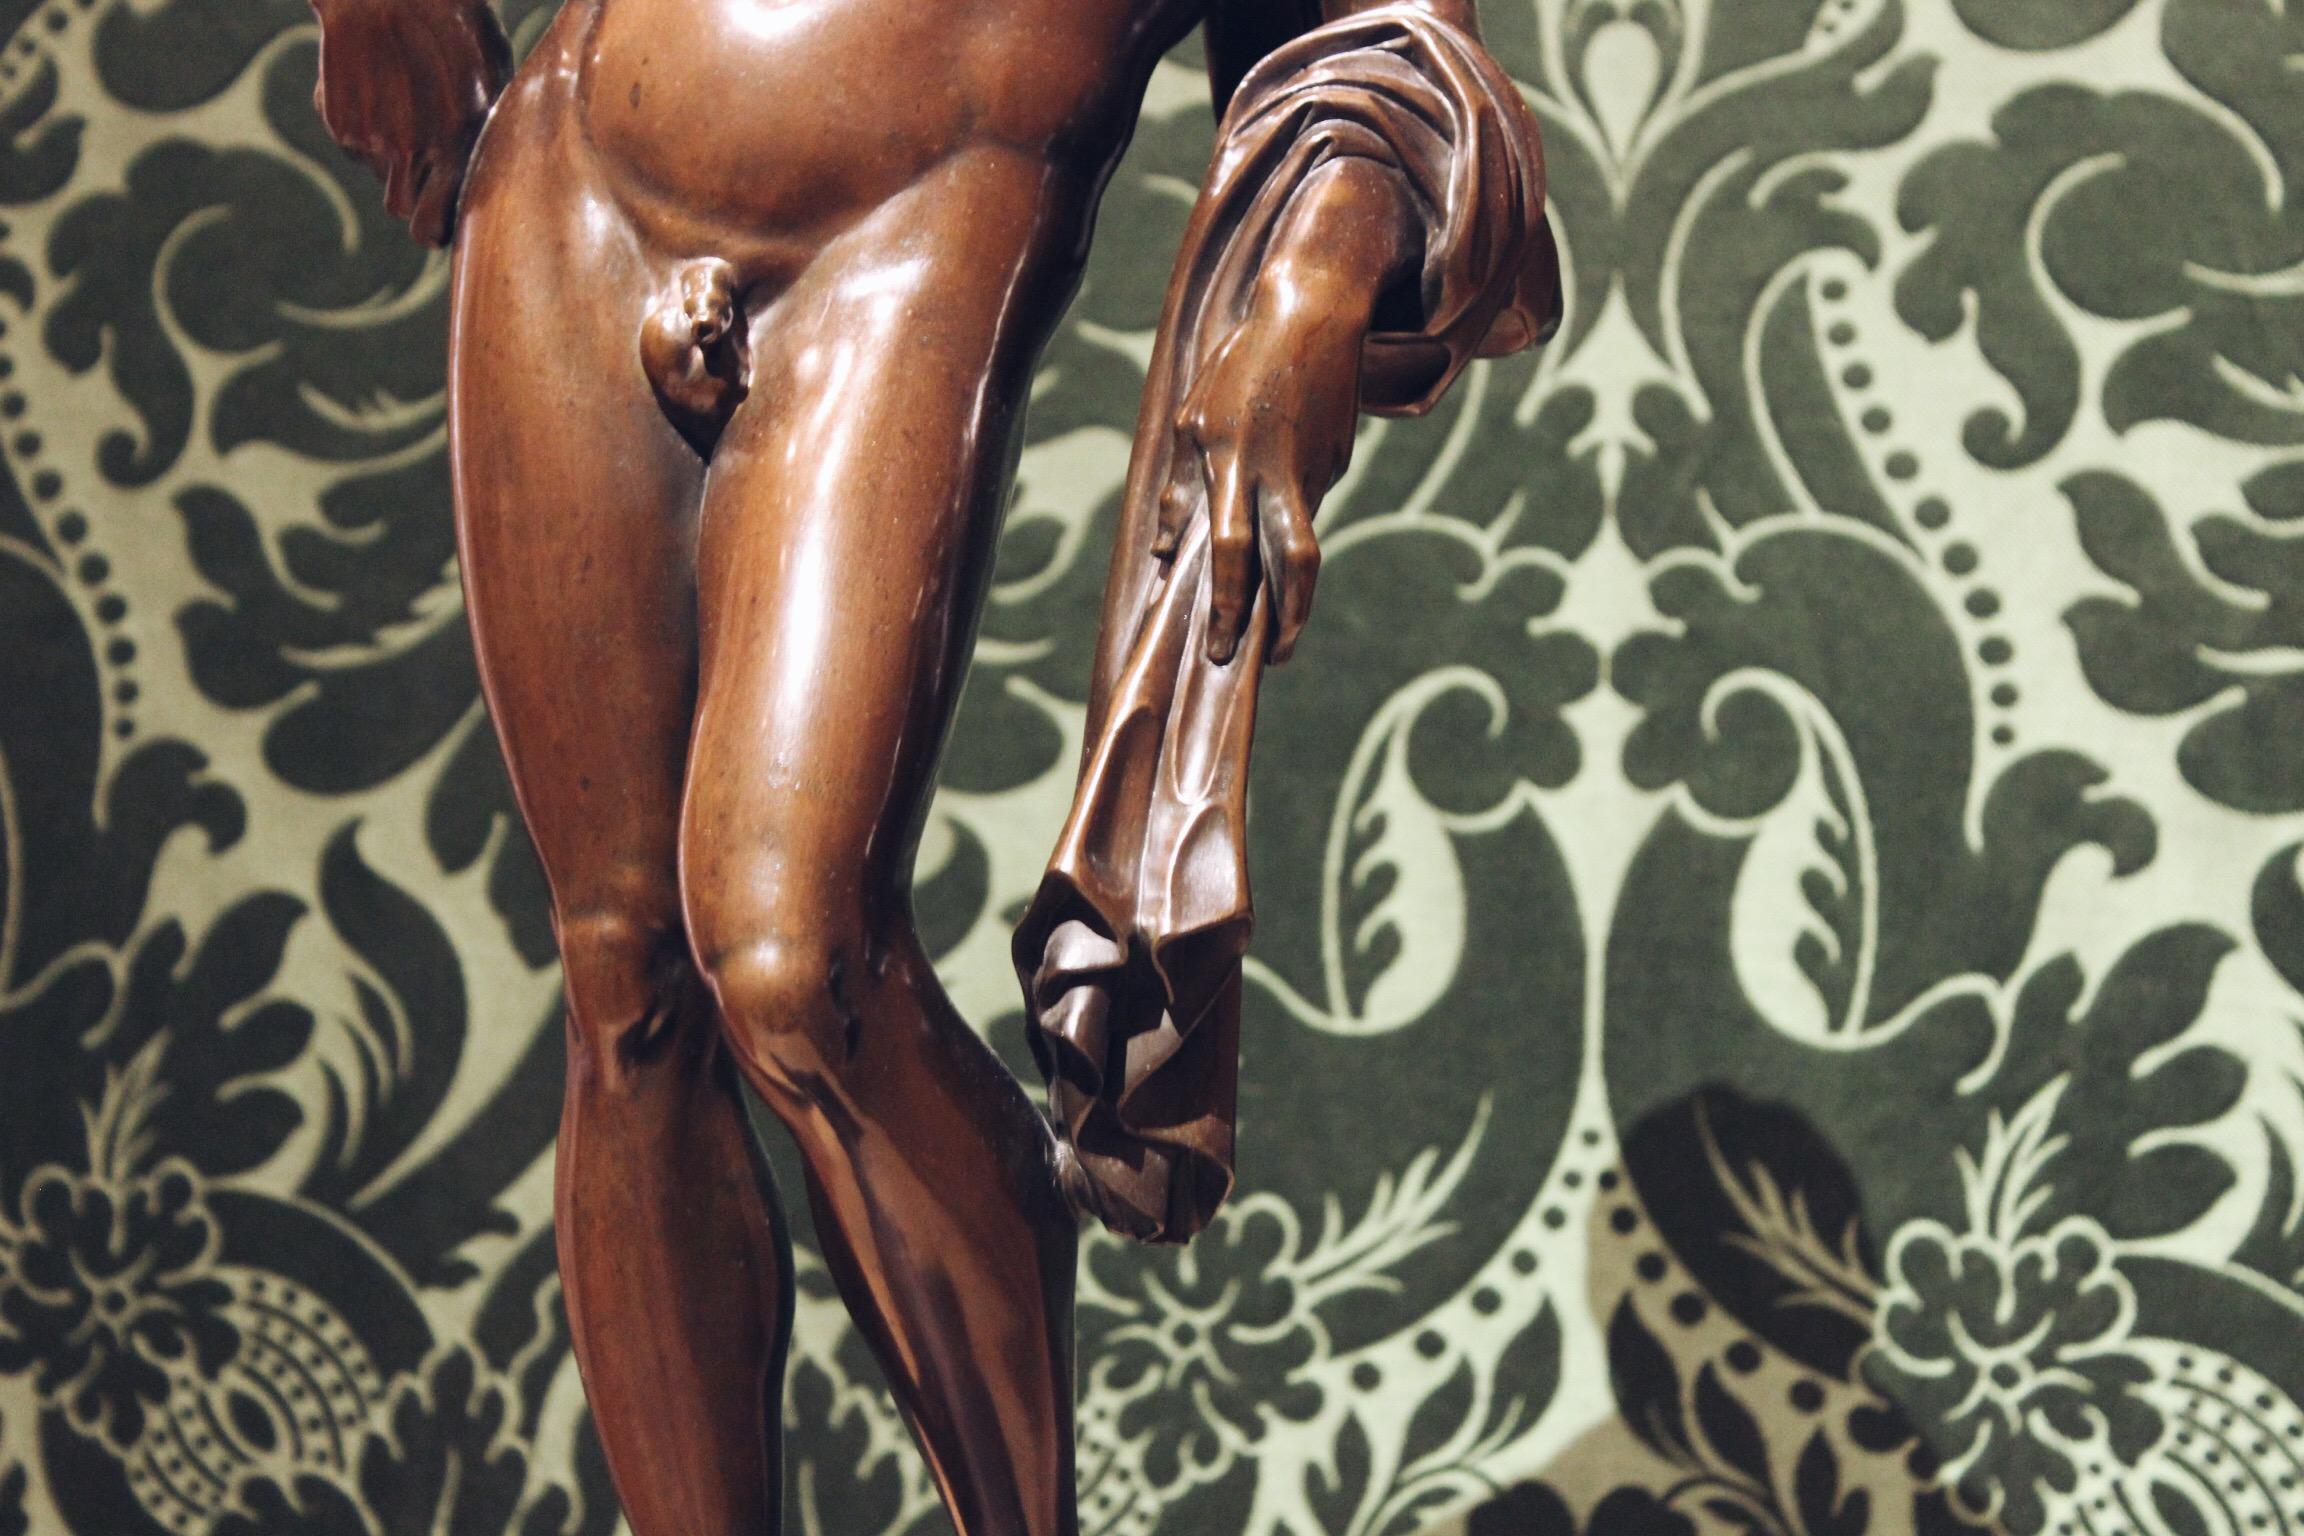 Statue Dick 2 - Getty.JPG